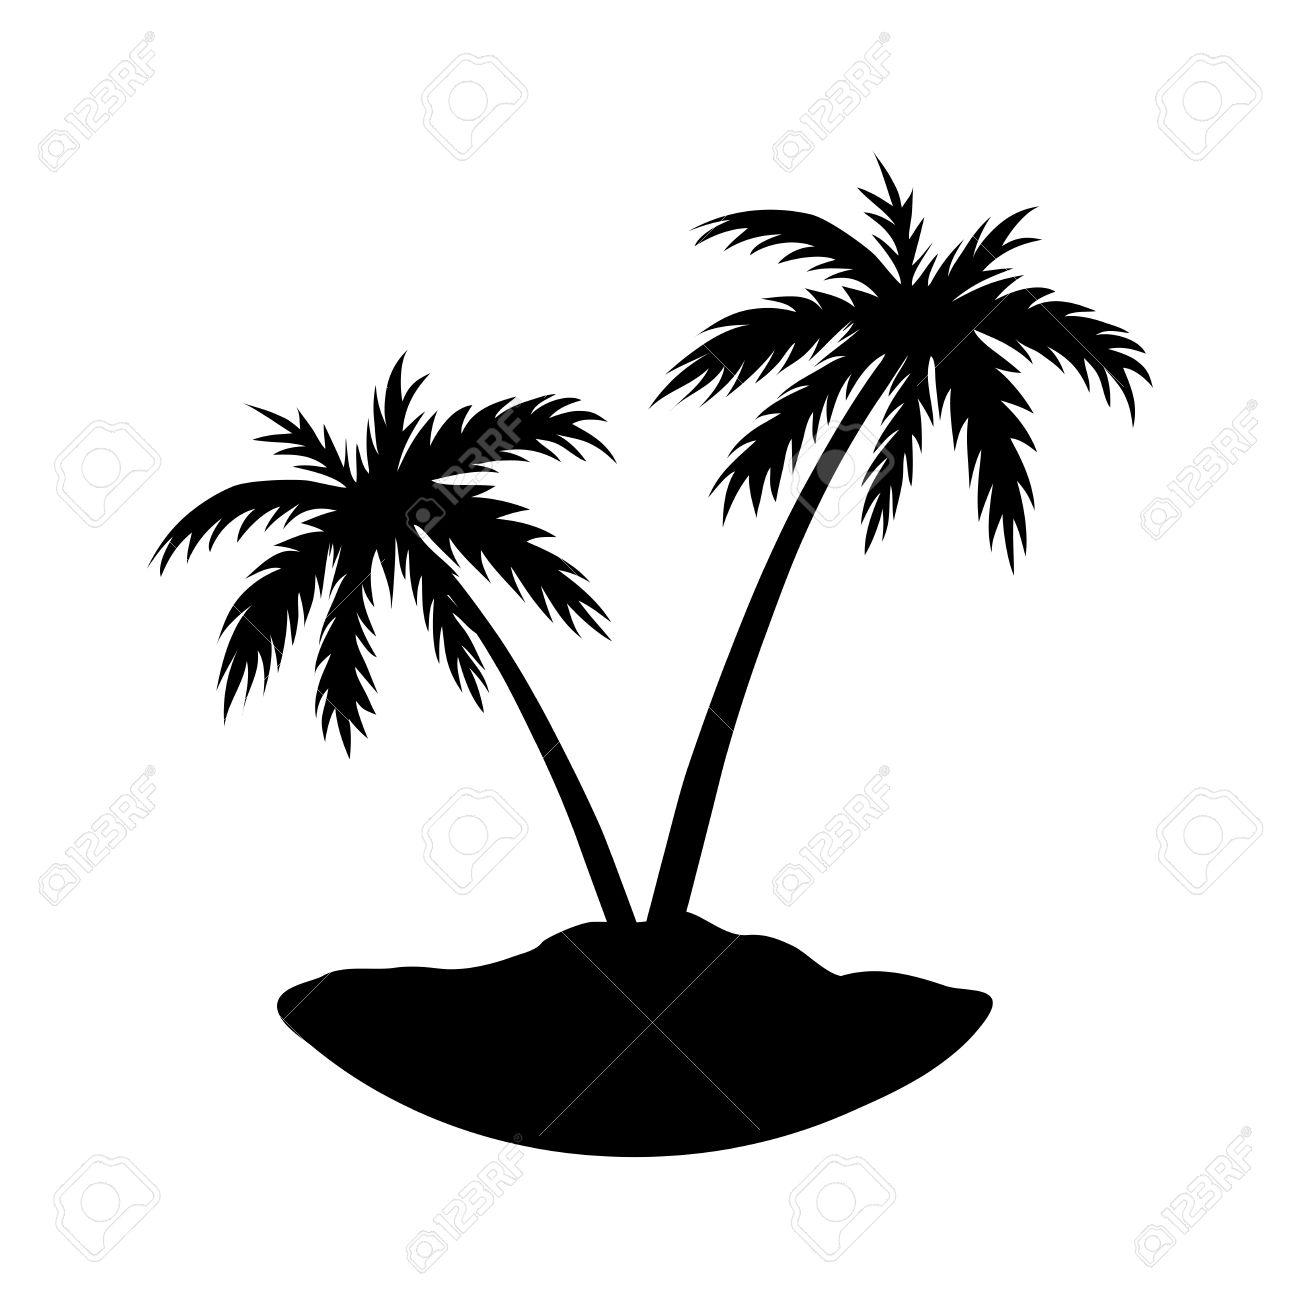 hight resolution of 1300x1300 black clipart coconut tree